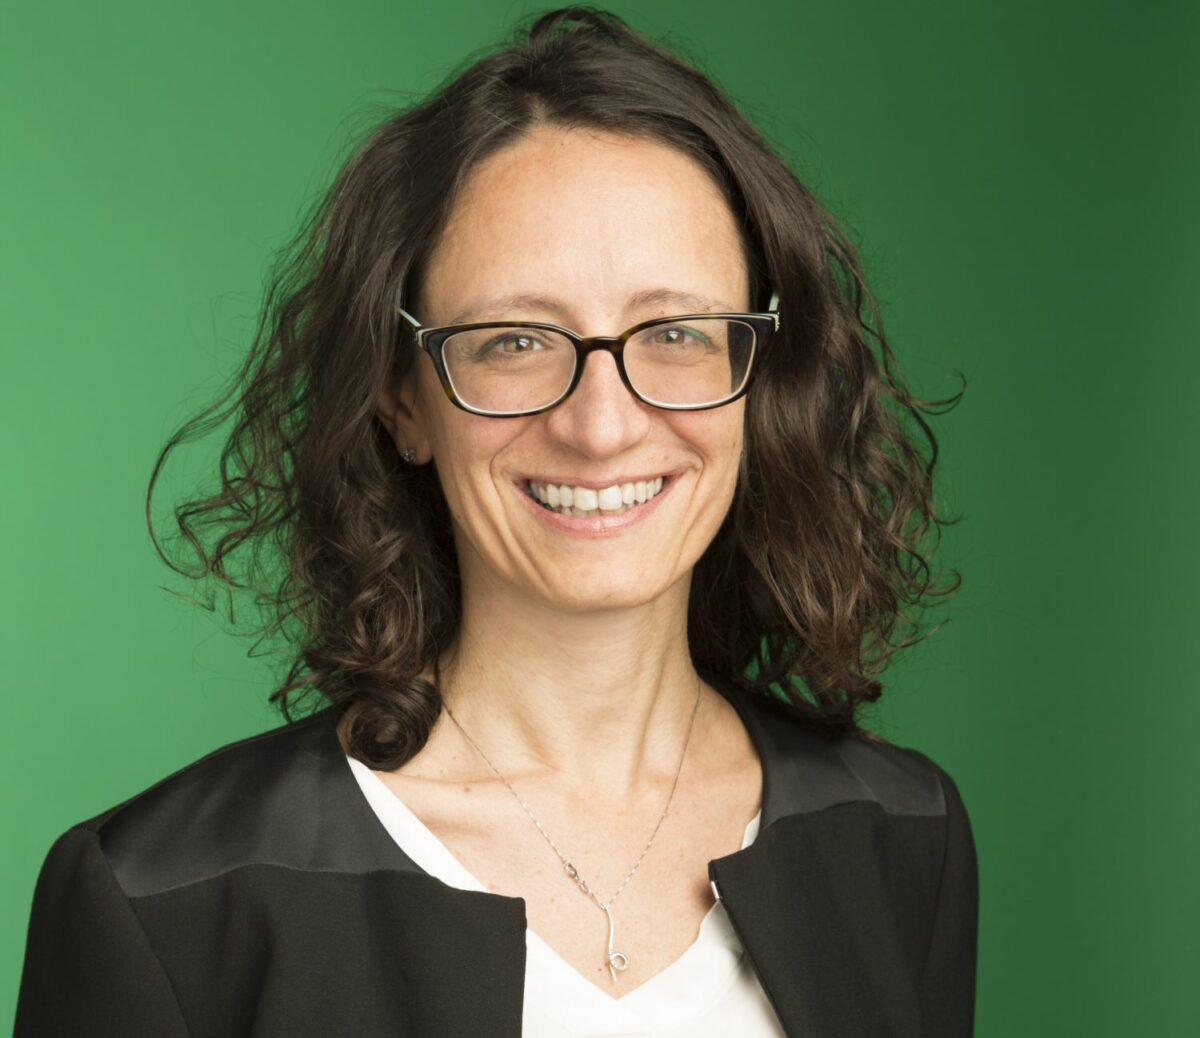 Lucia Cagnazzo, Banca Widiba